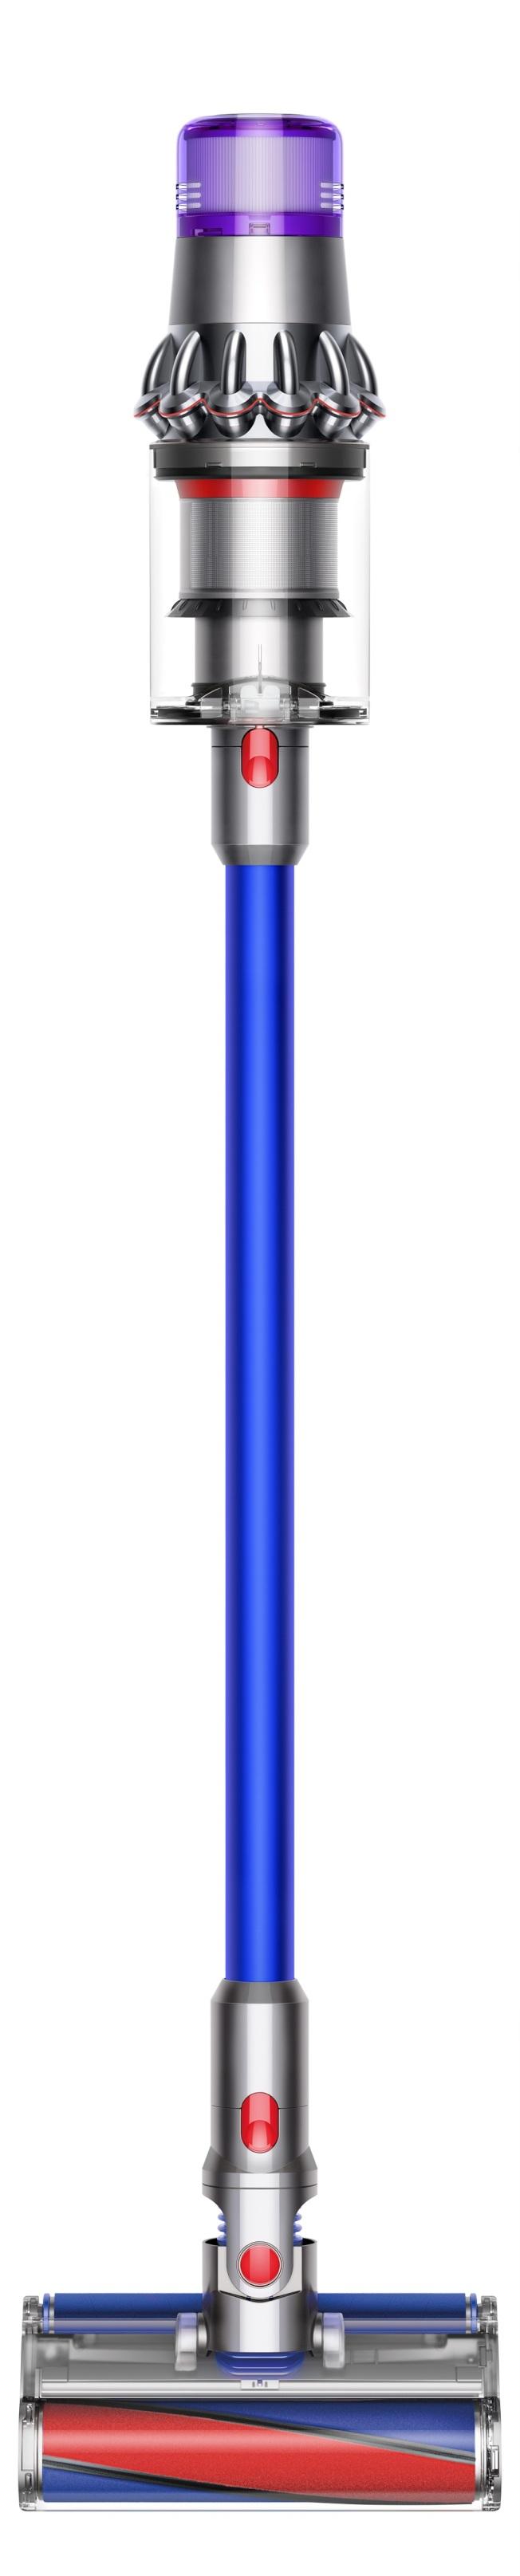 Dyson SV14 V11 Absolute手持無線吸塵器。(圖:網家提供)